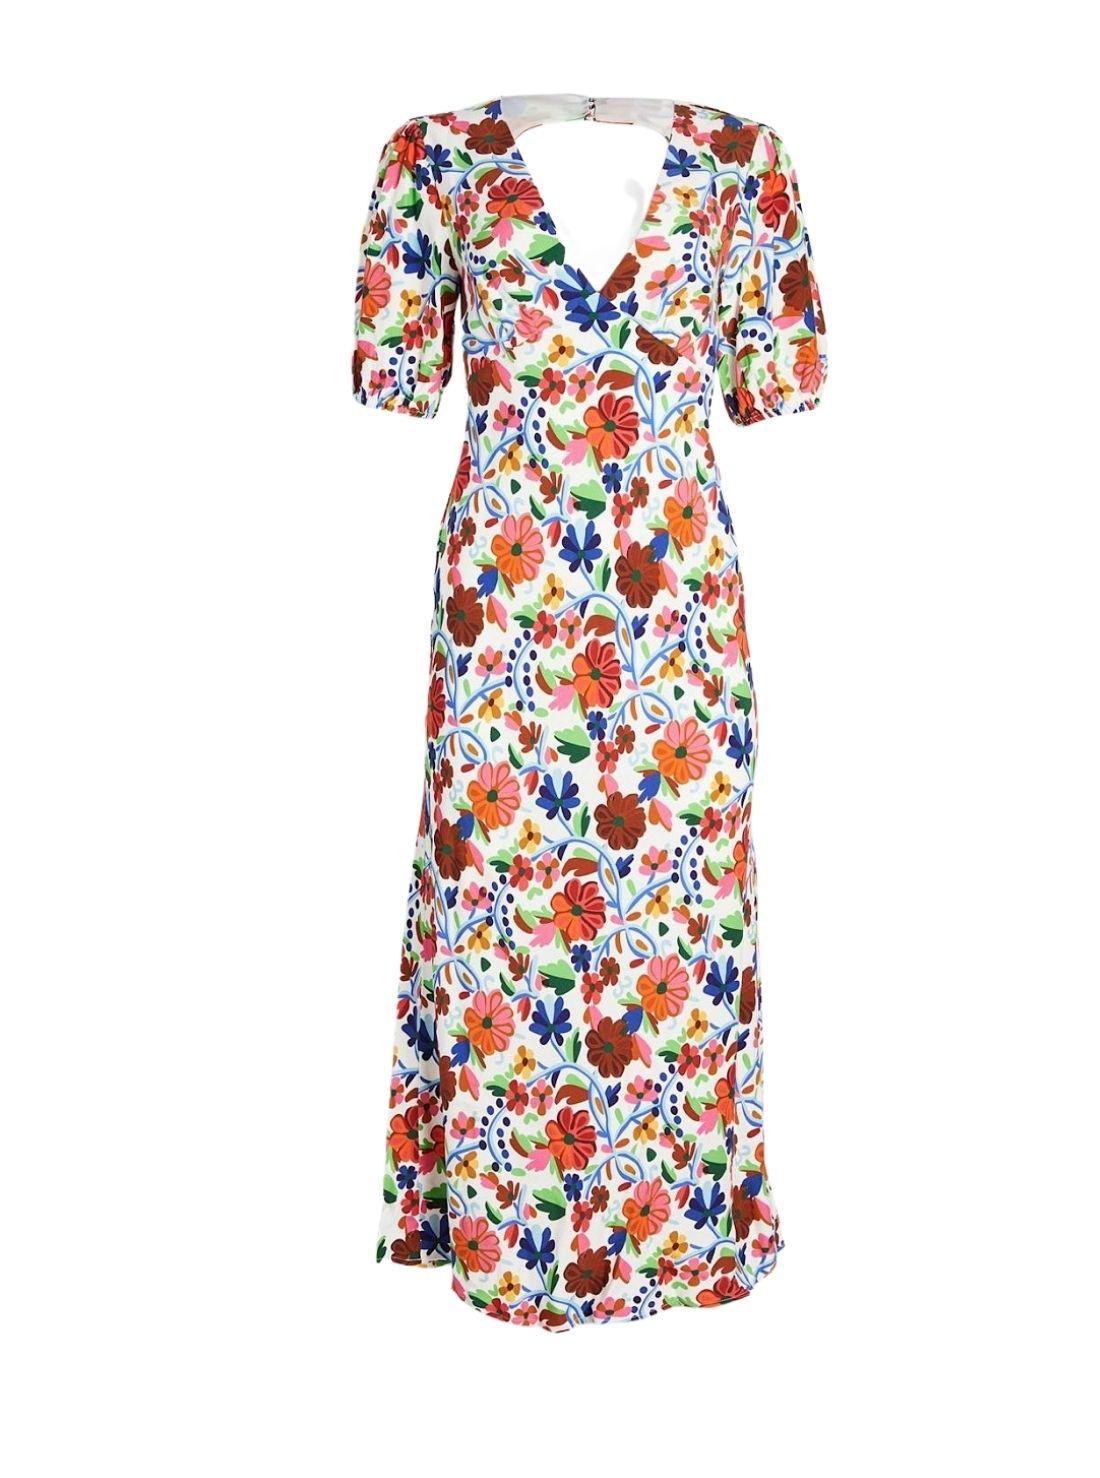 Boho Dress Perfect for Fall Season